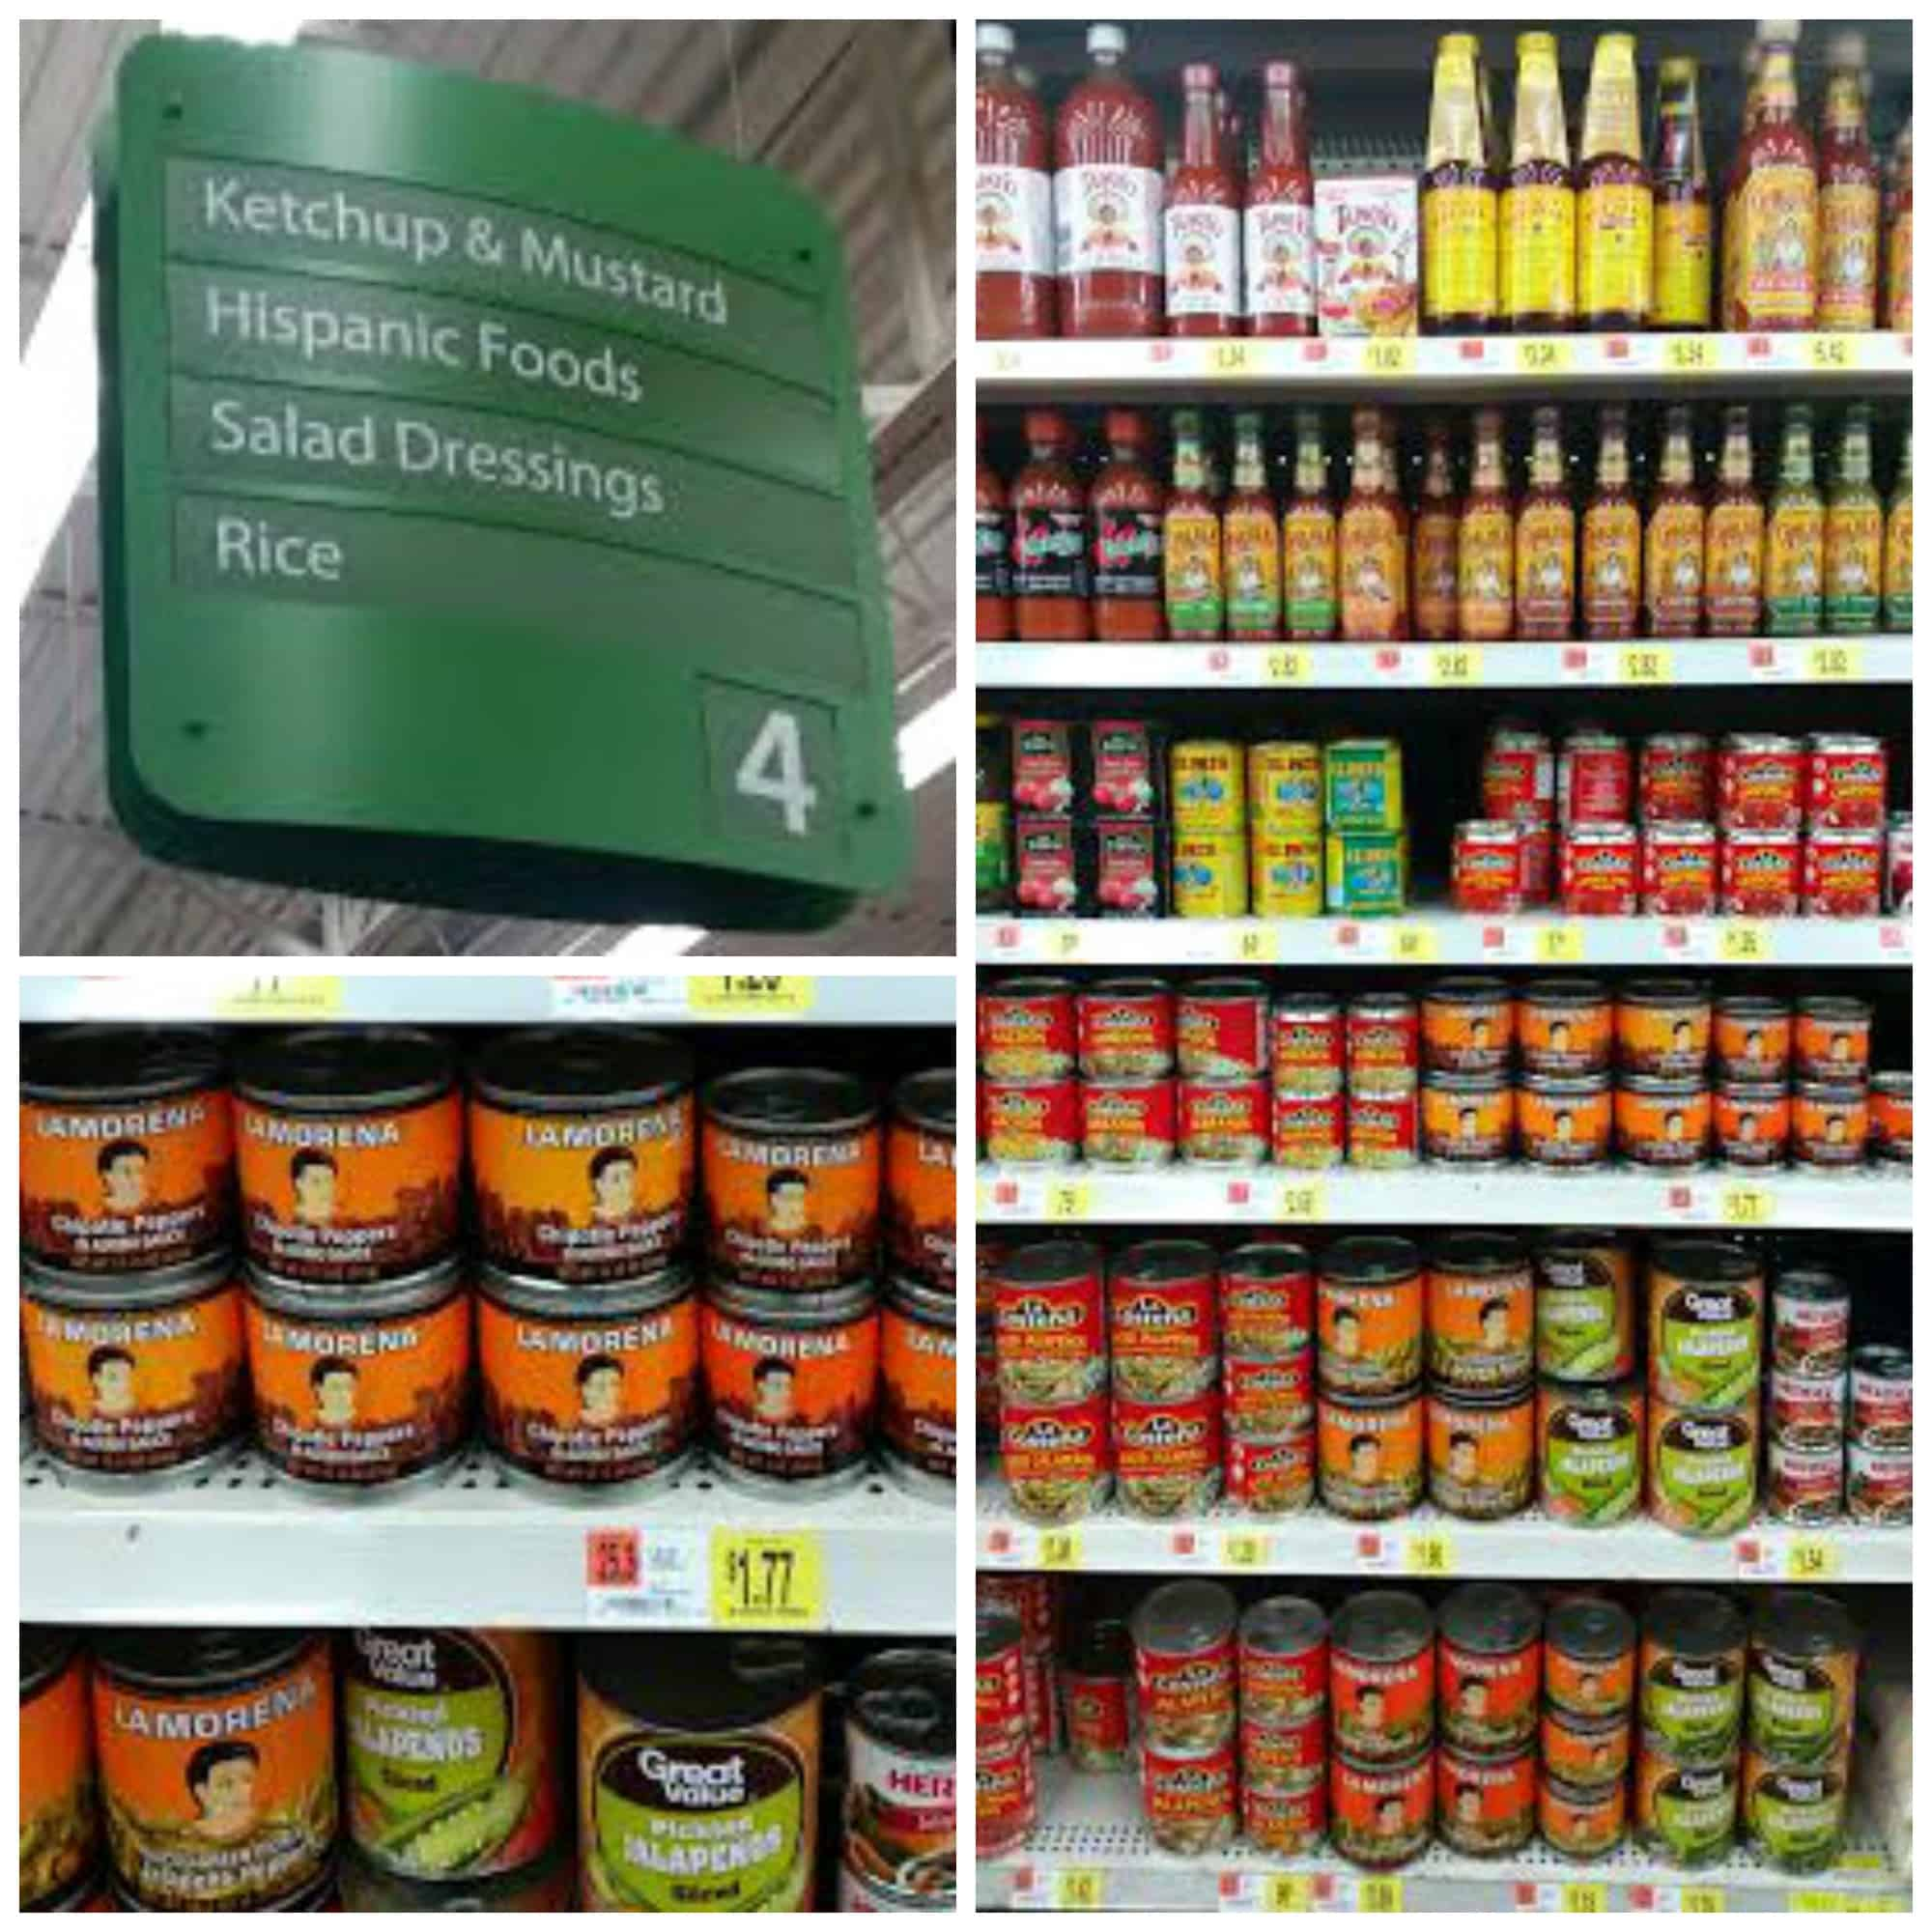 La Morena Chipotle Peppers Walmart Store Shot